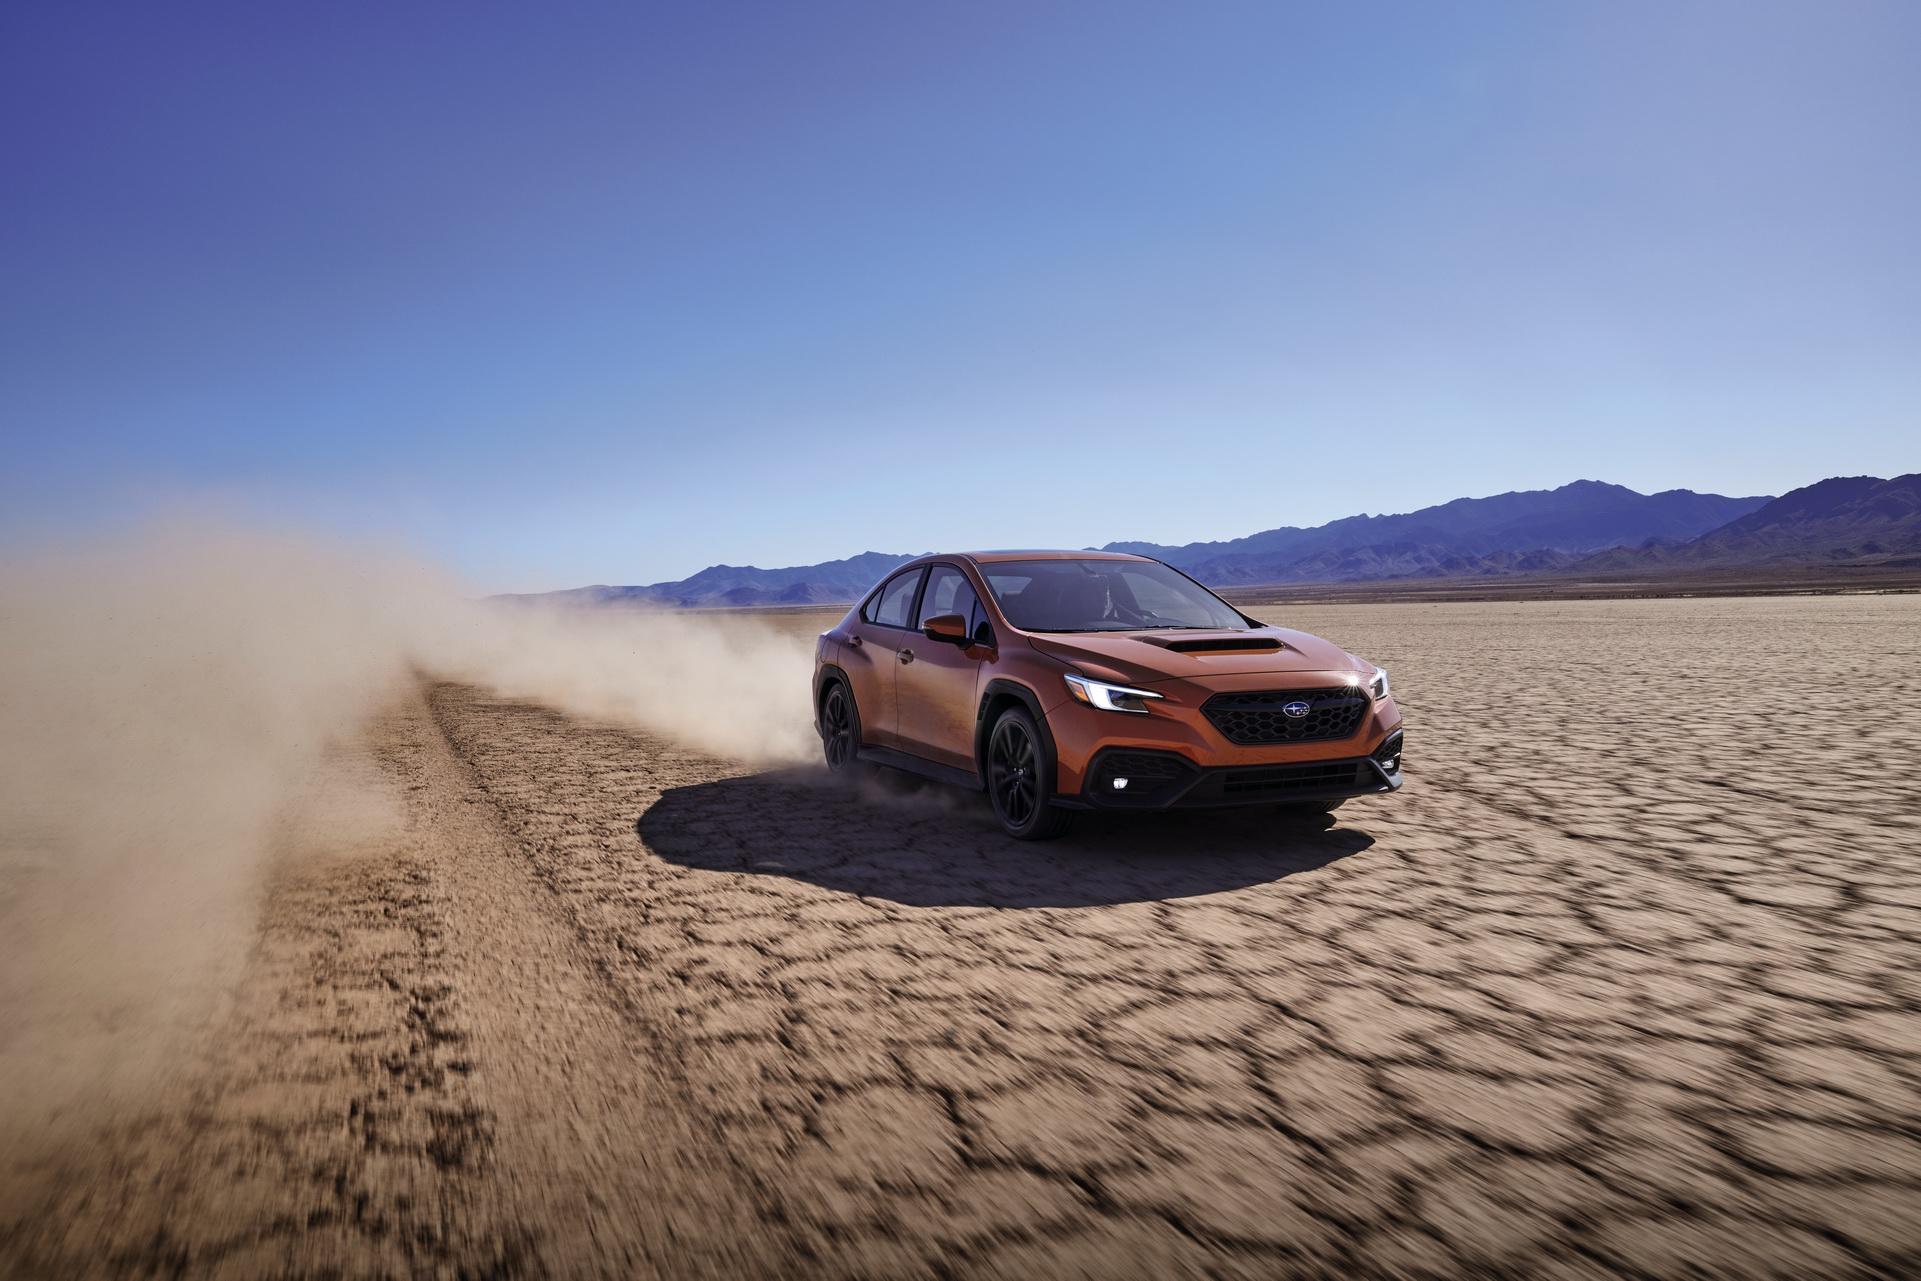 2022 Subaru WRX Front Three-Quarter Wallpapers #15 of 61